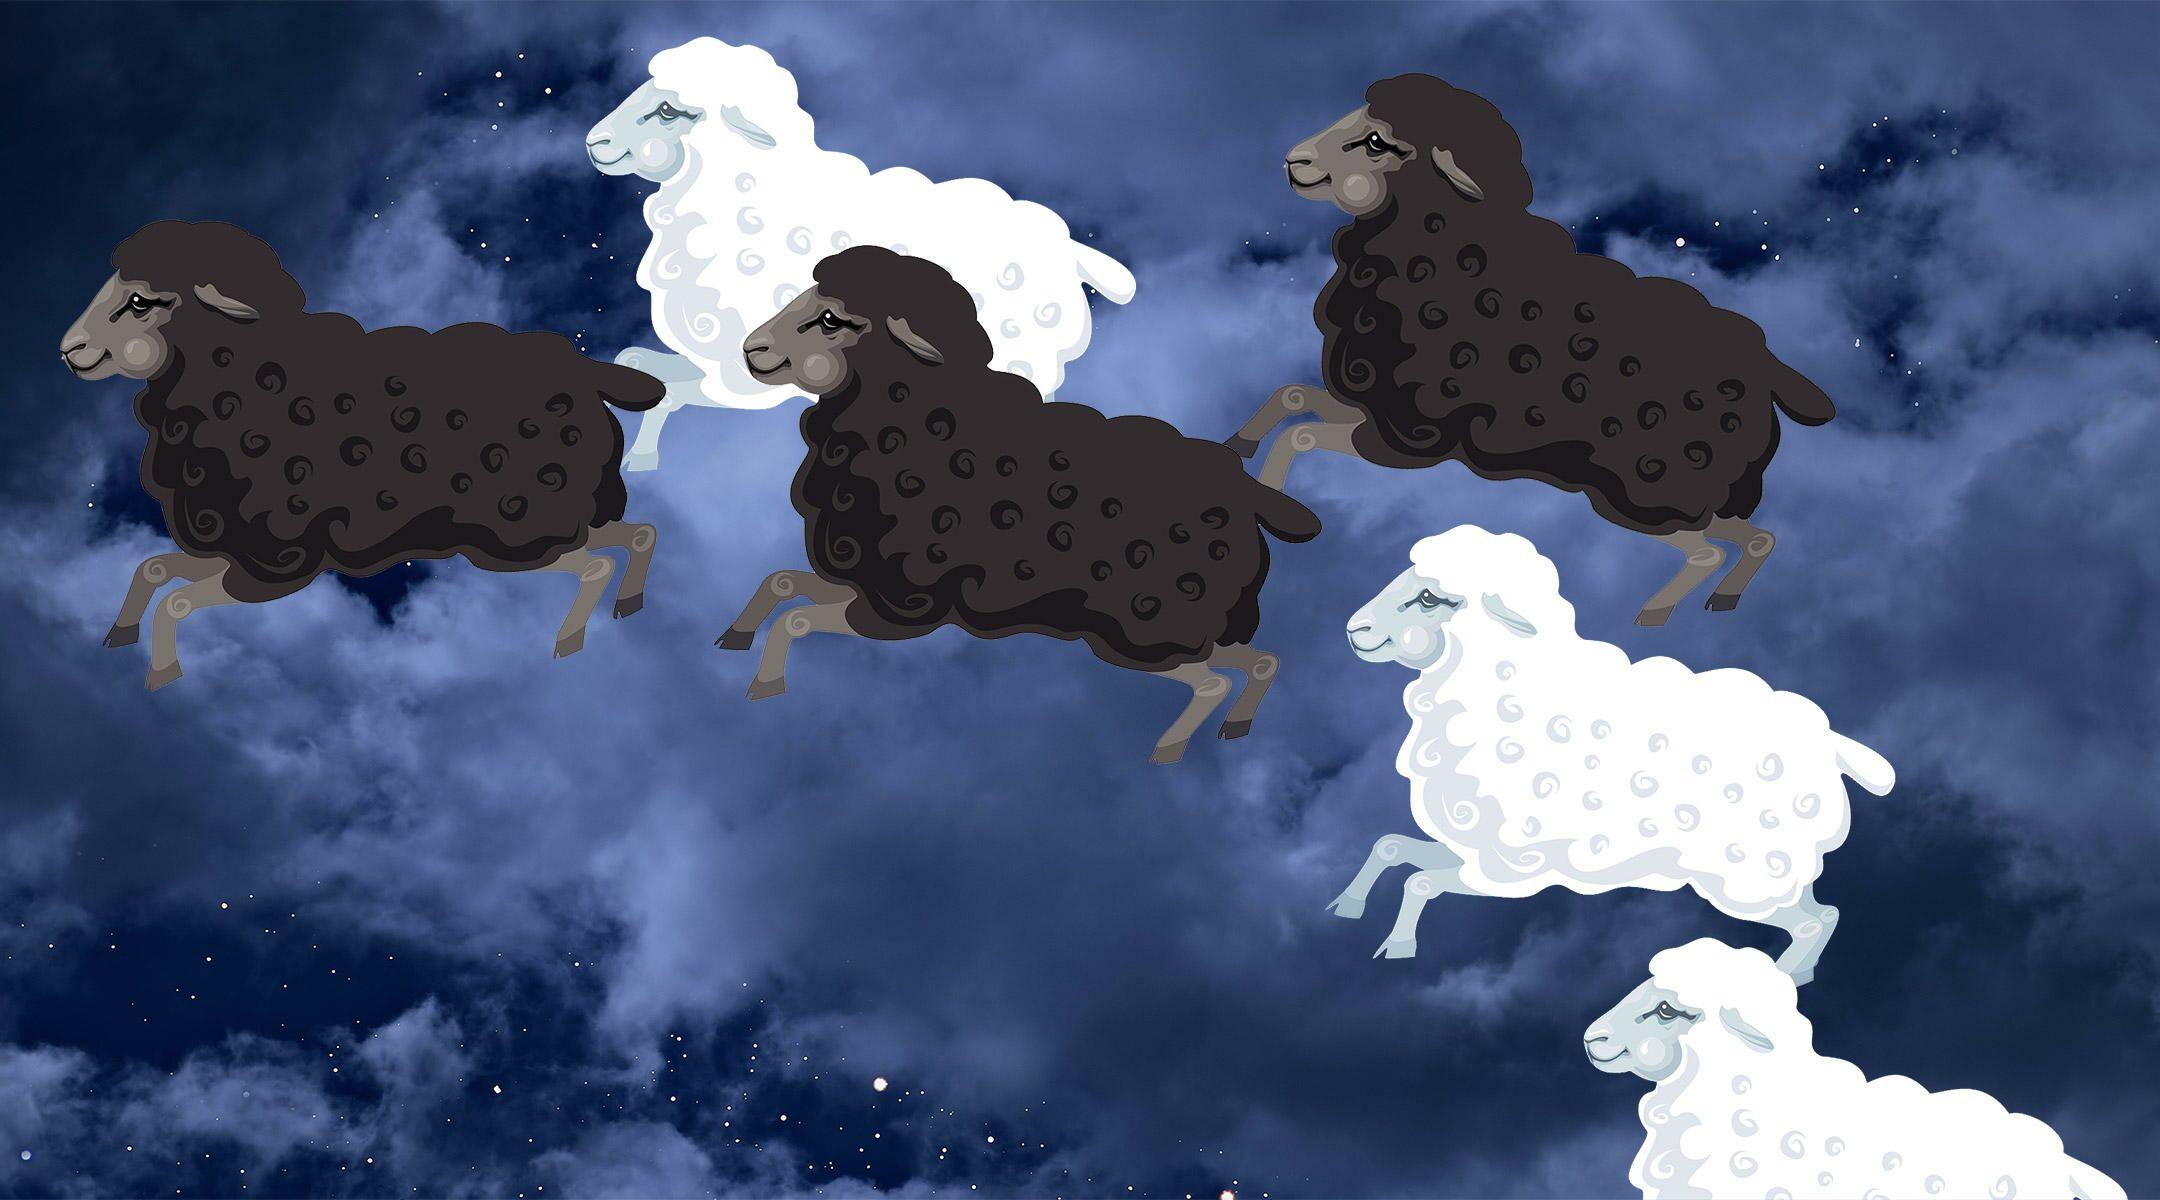 counting sheep at night because hard time sleeping